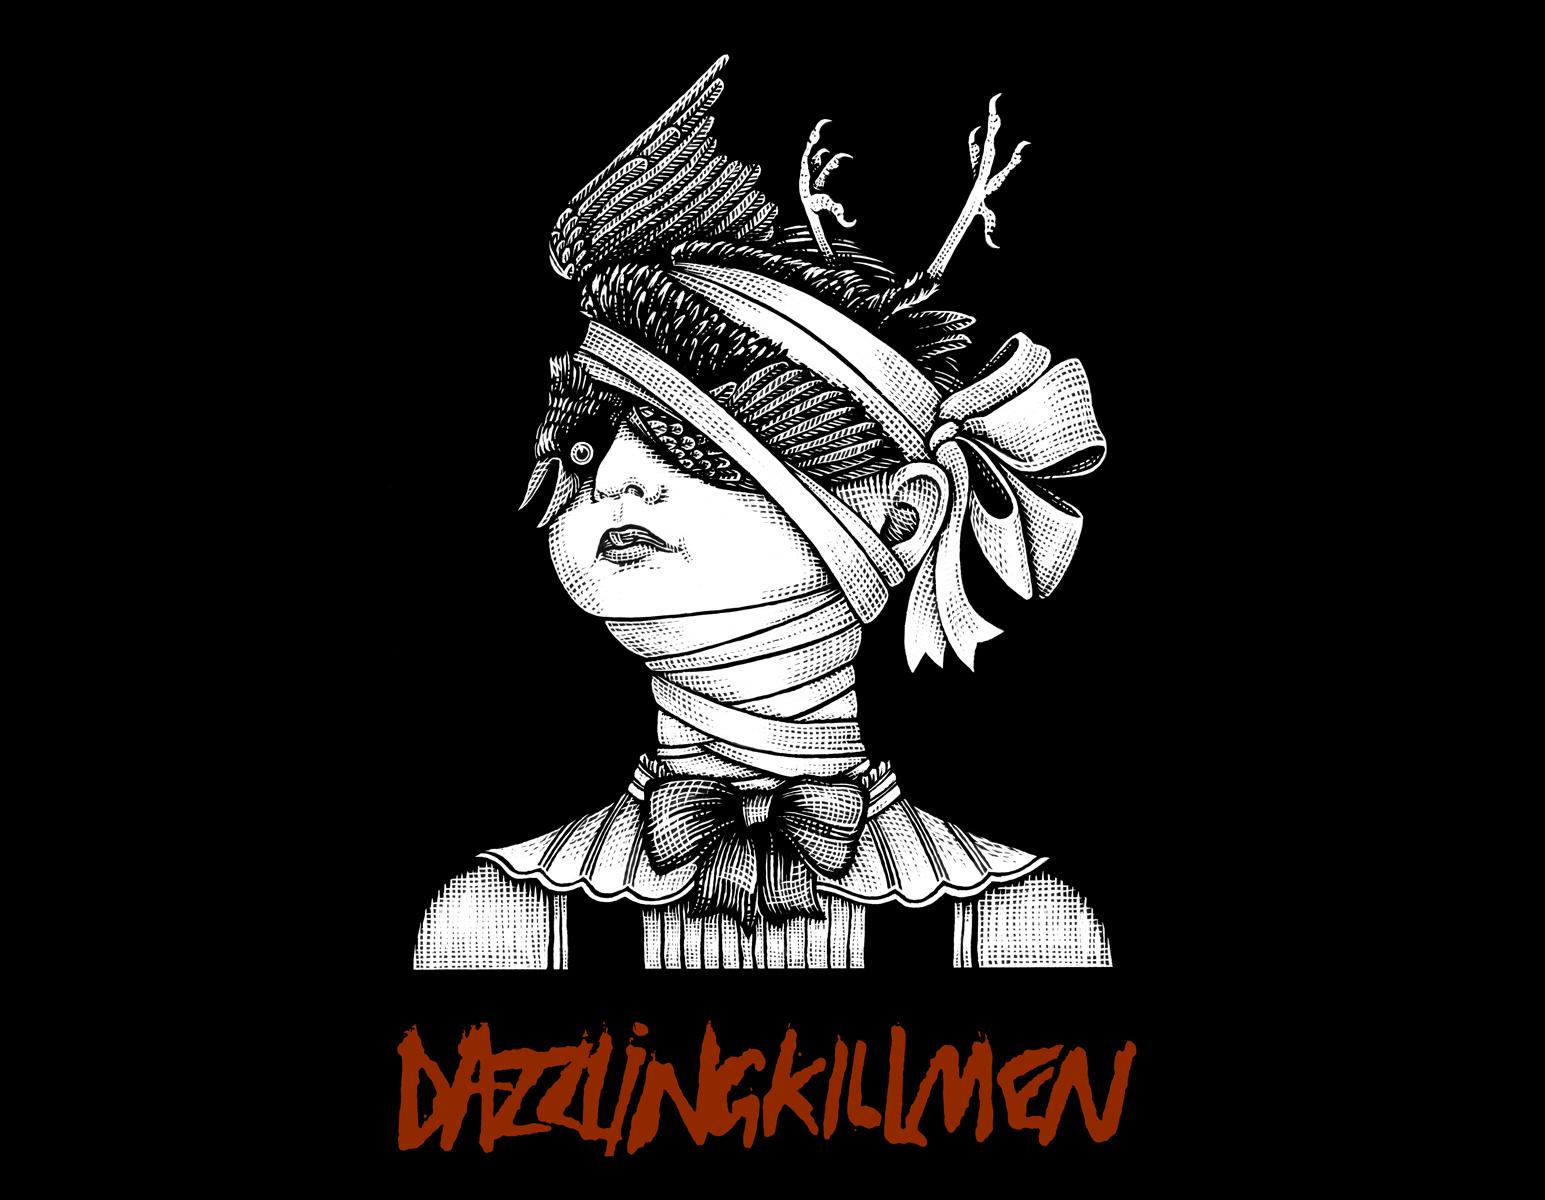 Dazzling Killmen,  Crow Head .  T-Shirt Design .  Drawn 2013, printed 2017. Pen and ink, Scratch board.